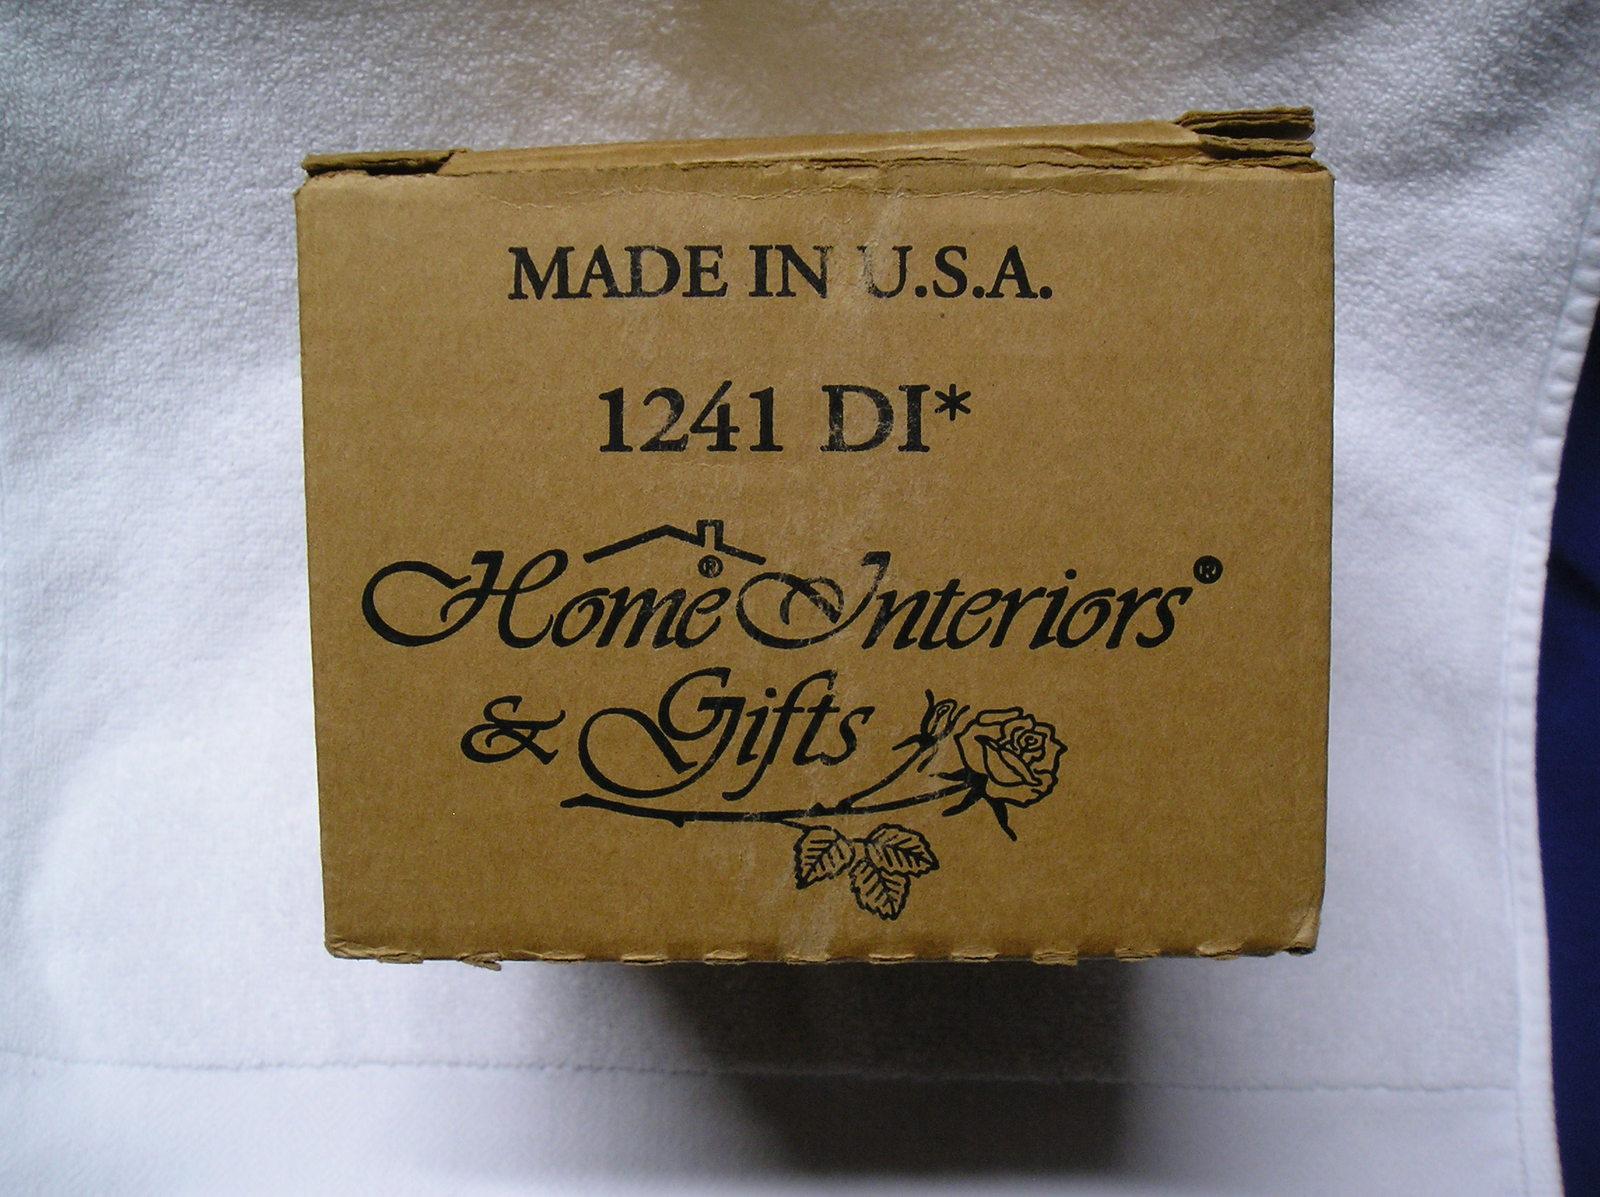 20 Homco Home Interiors 12201 Small Diamond and 20 similar items